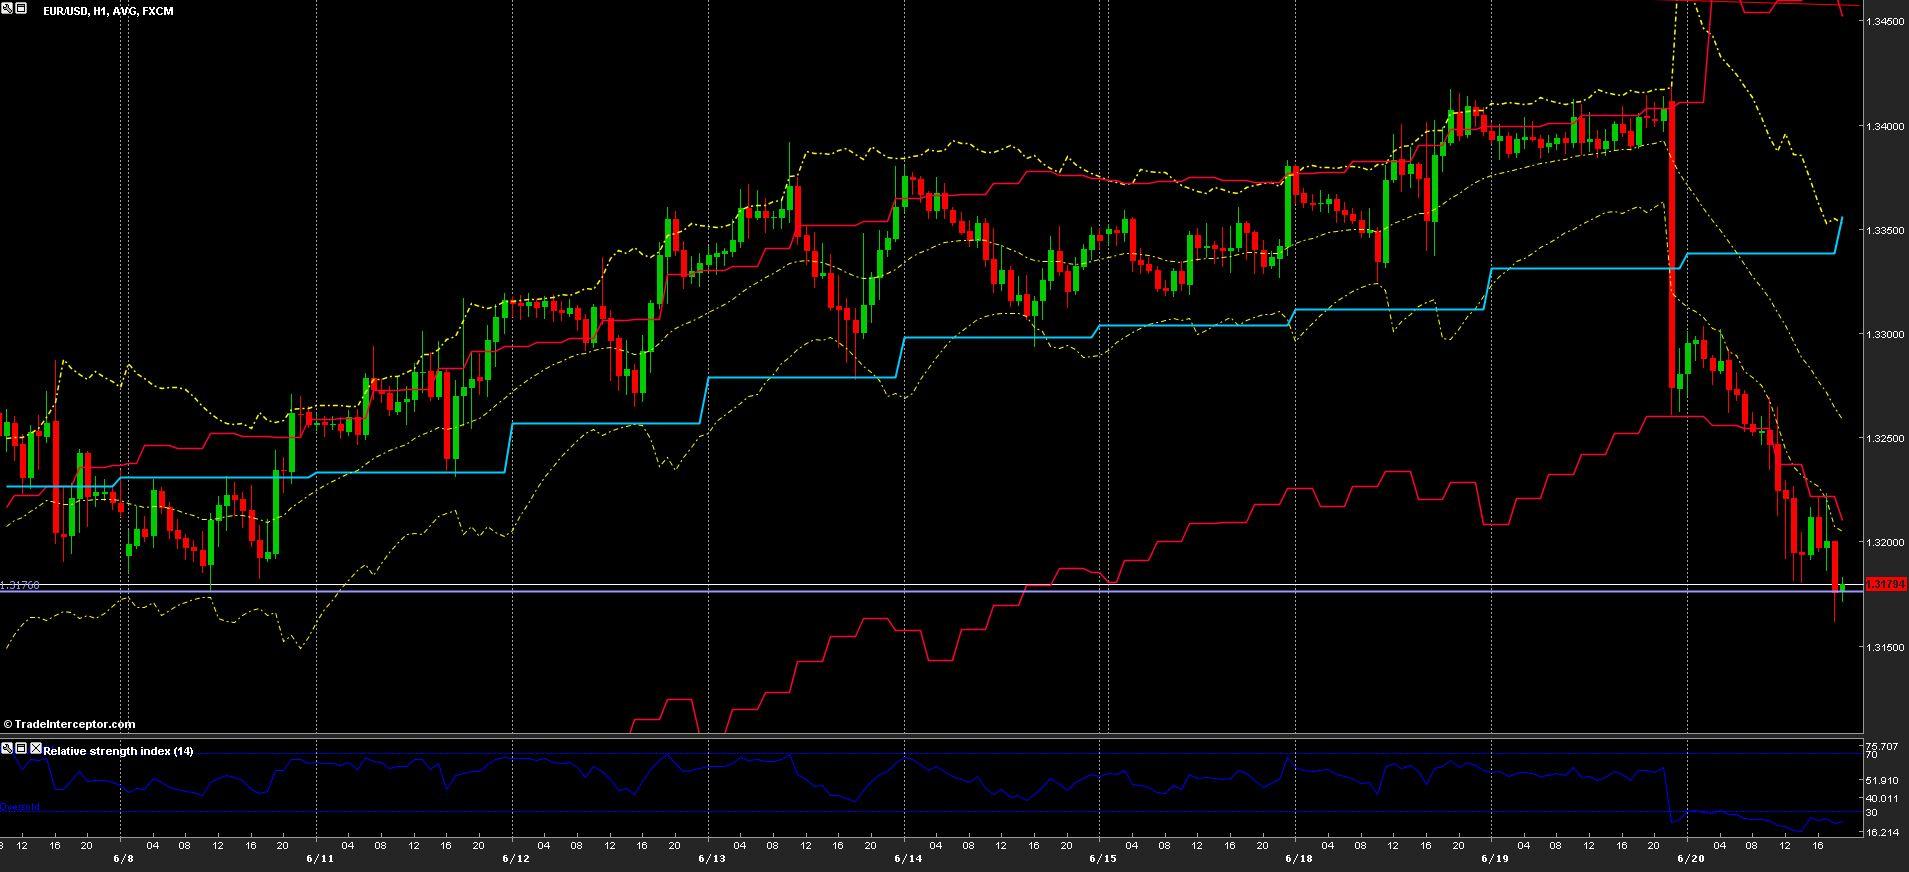 EUR/USD chart 20/06/2013